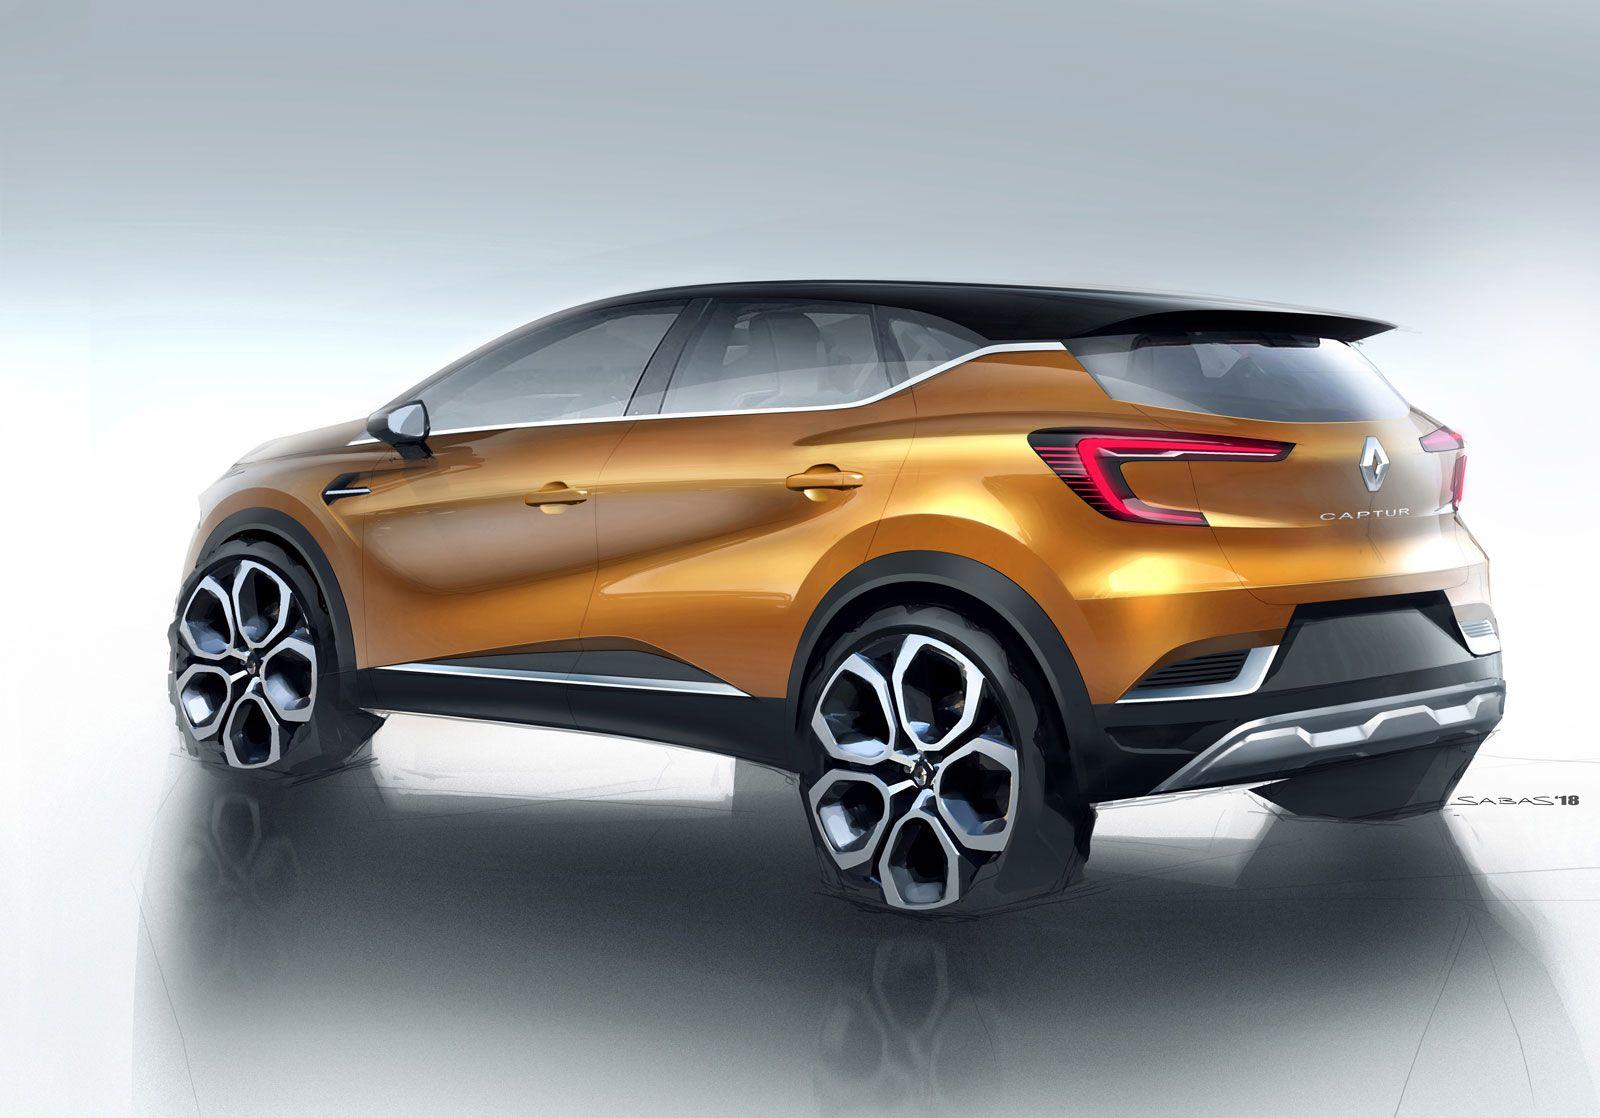 New Renault Captur Design Sketch Render Renault Captur New